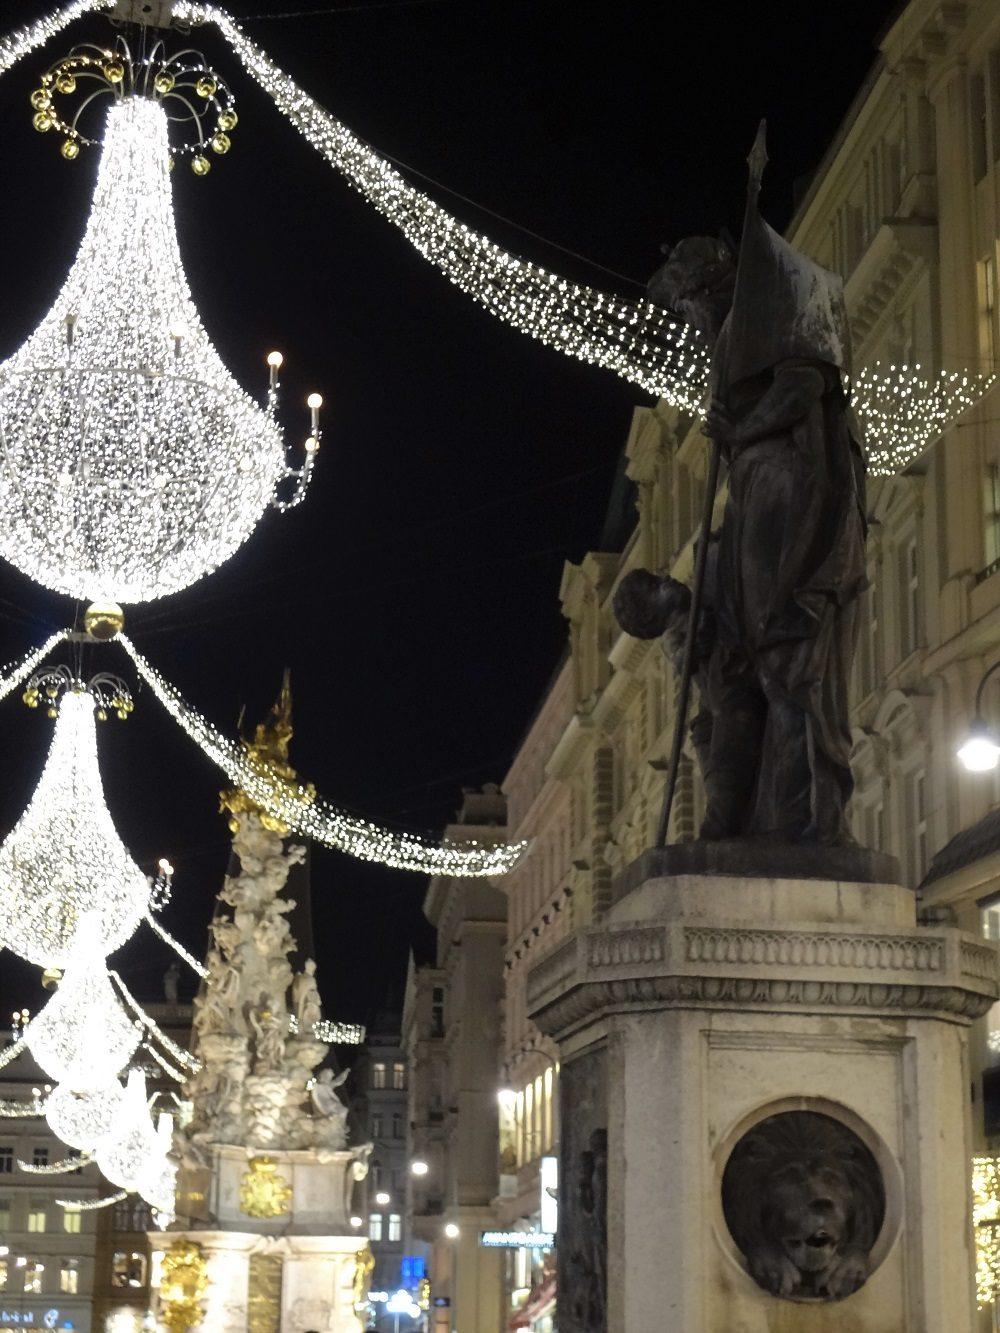 Weihnachtsbeleuchtung-Wien Graben Leopoldsbrunnen